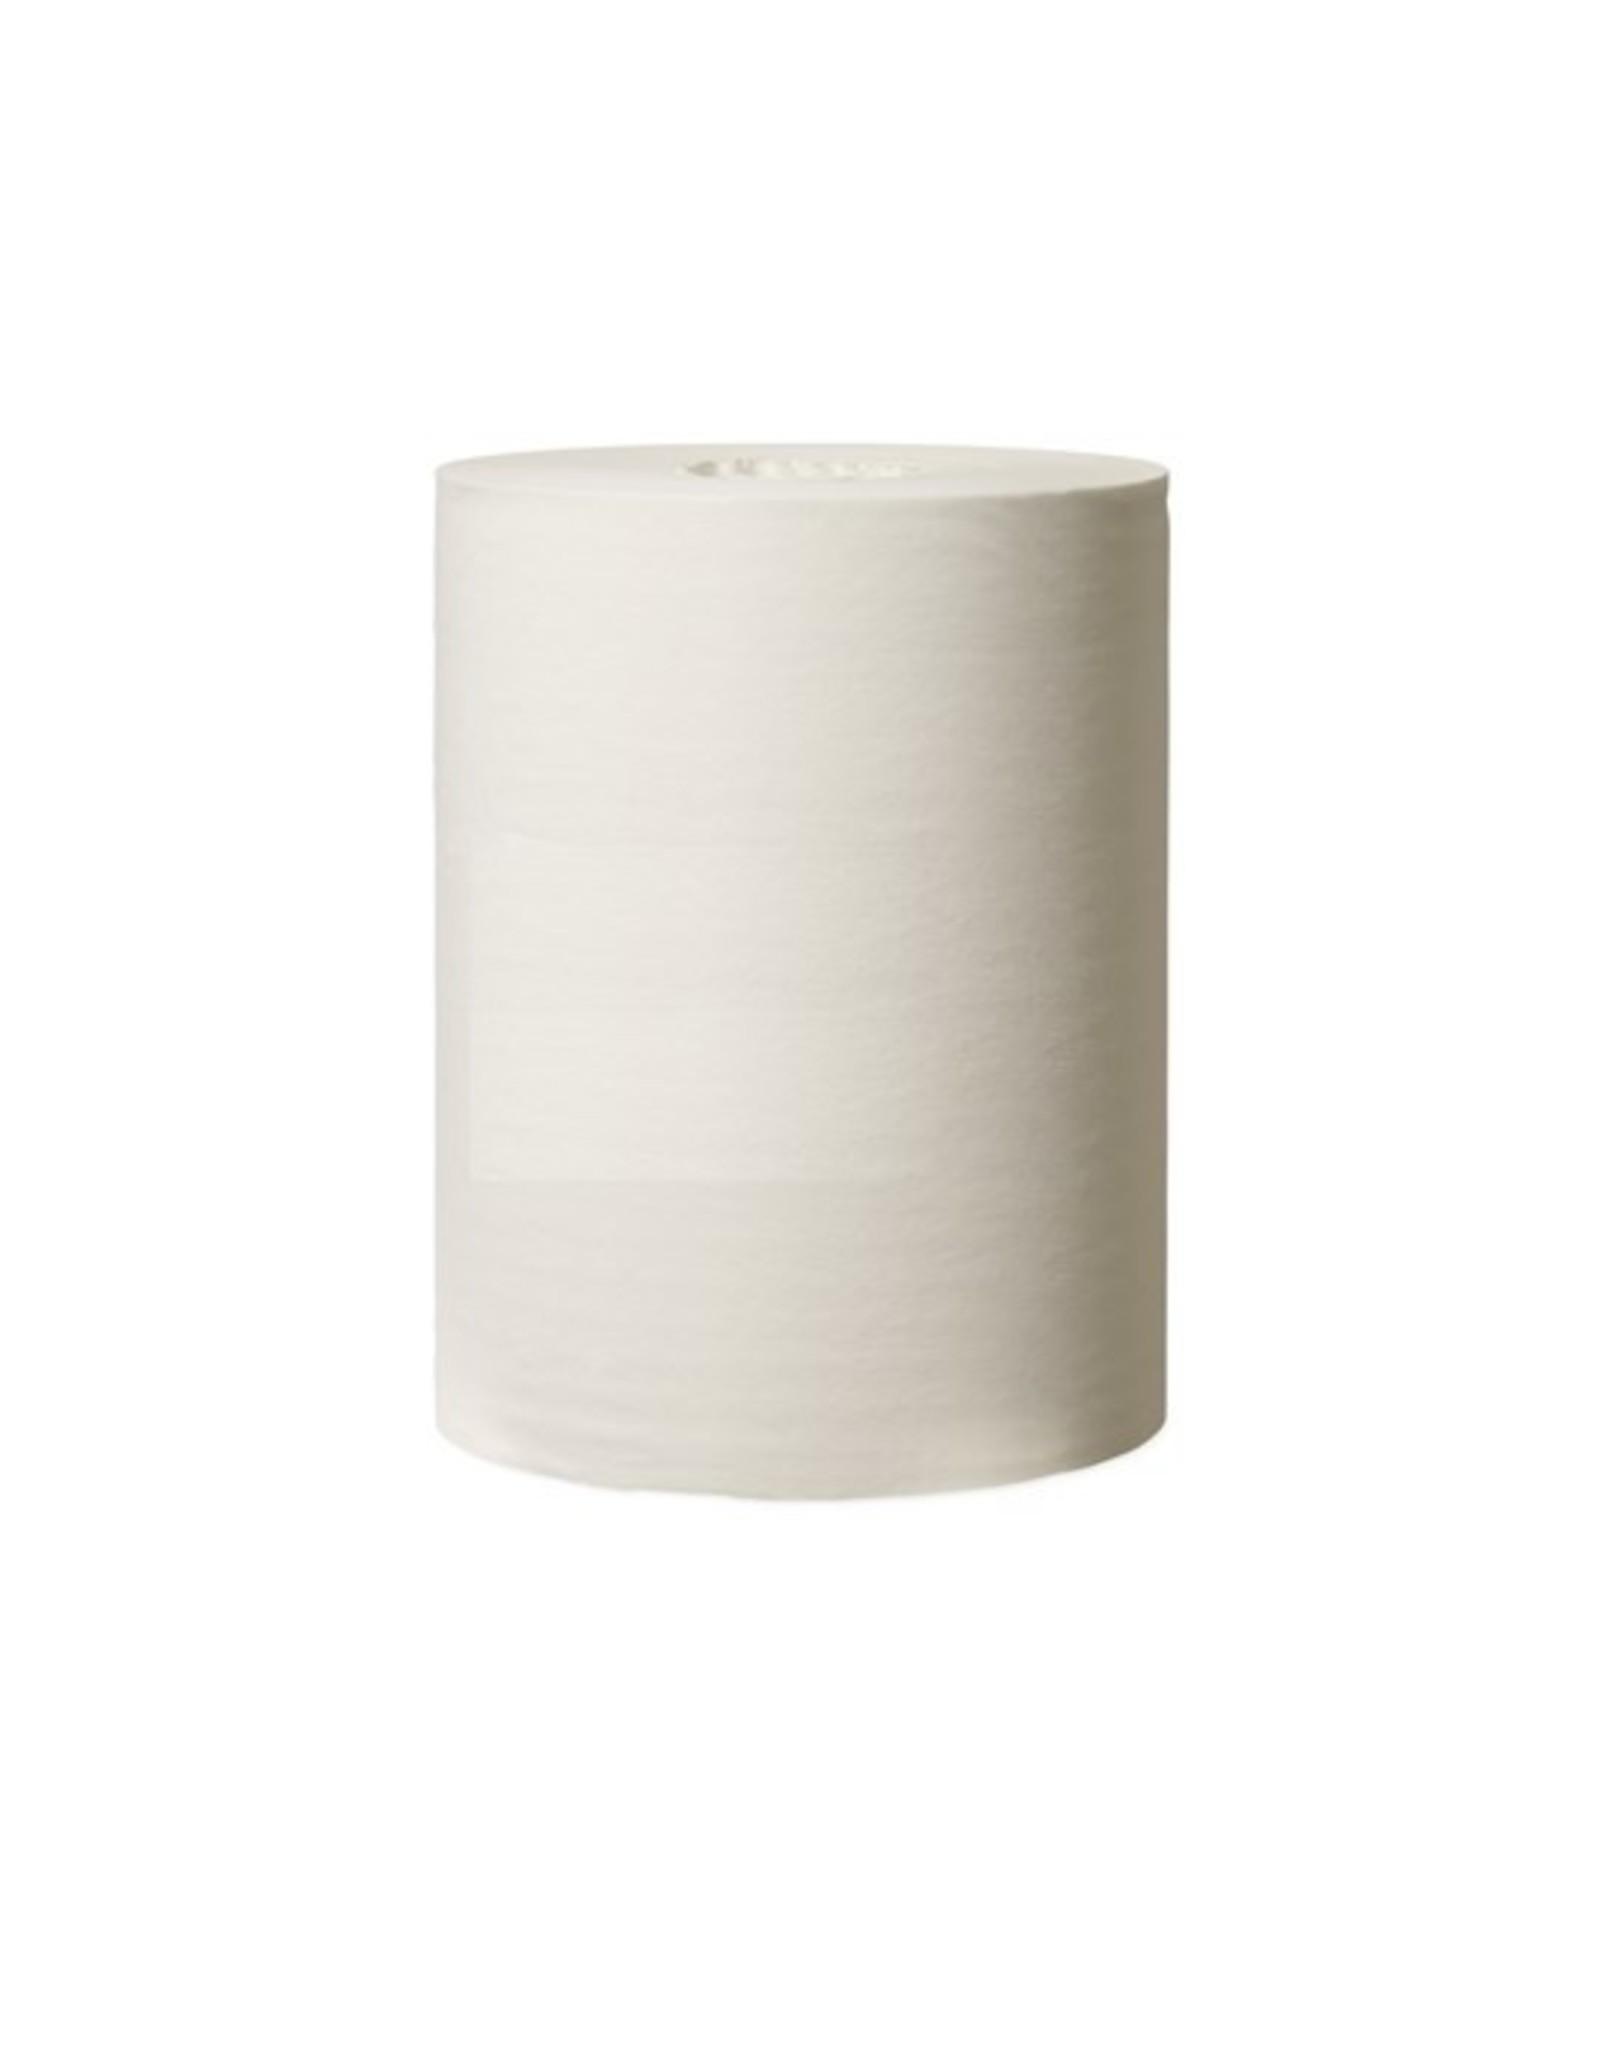 CMT Blanco mini-rol, 1-laags, wit, kernloos, 120 mtr x 21,5 cm. 1 Rol